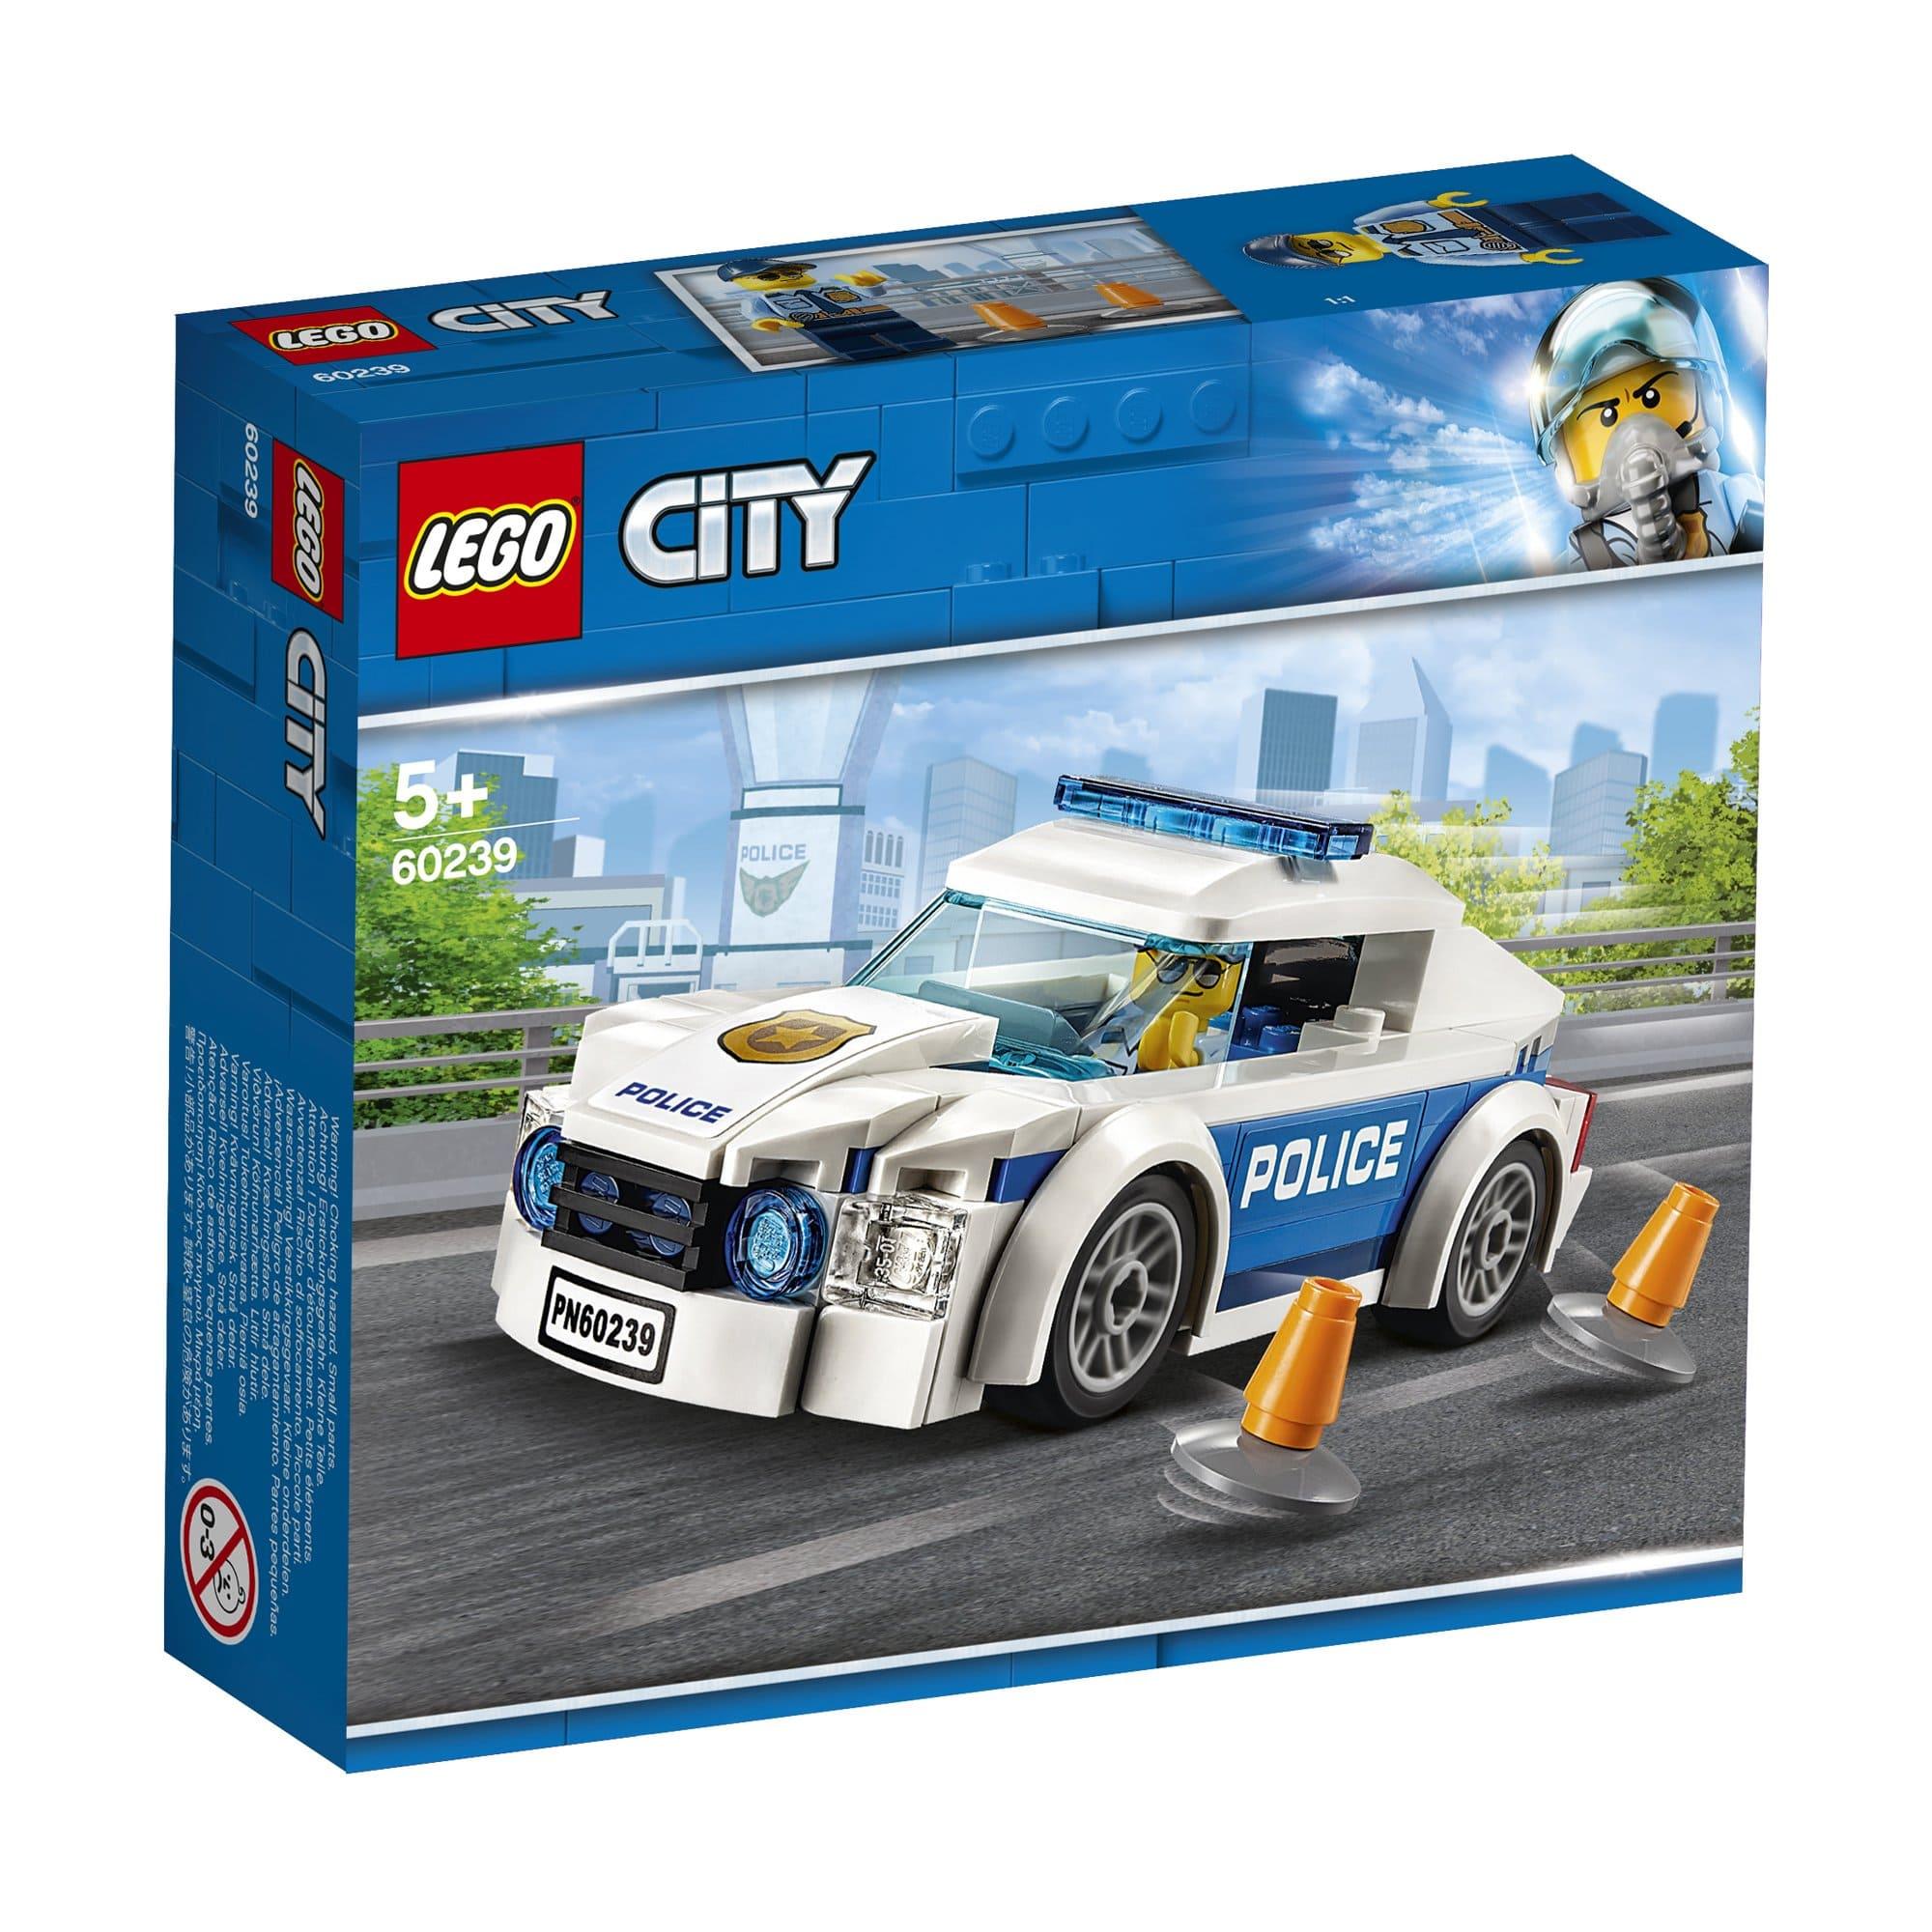 LEGO 樂高積木 City Police 60239 警察巡邏車